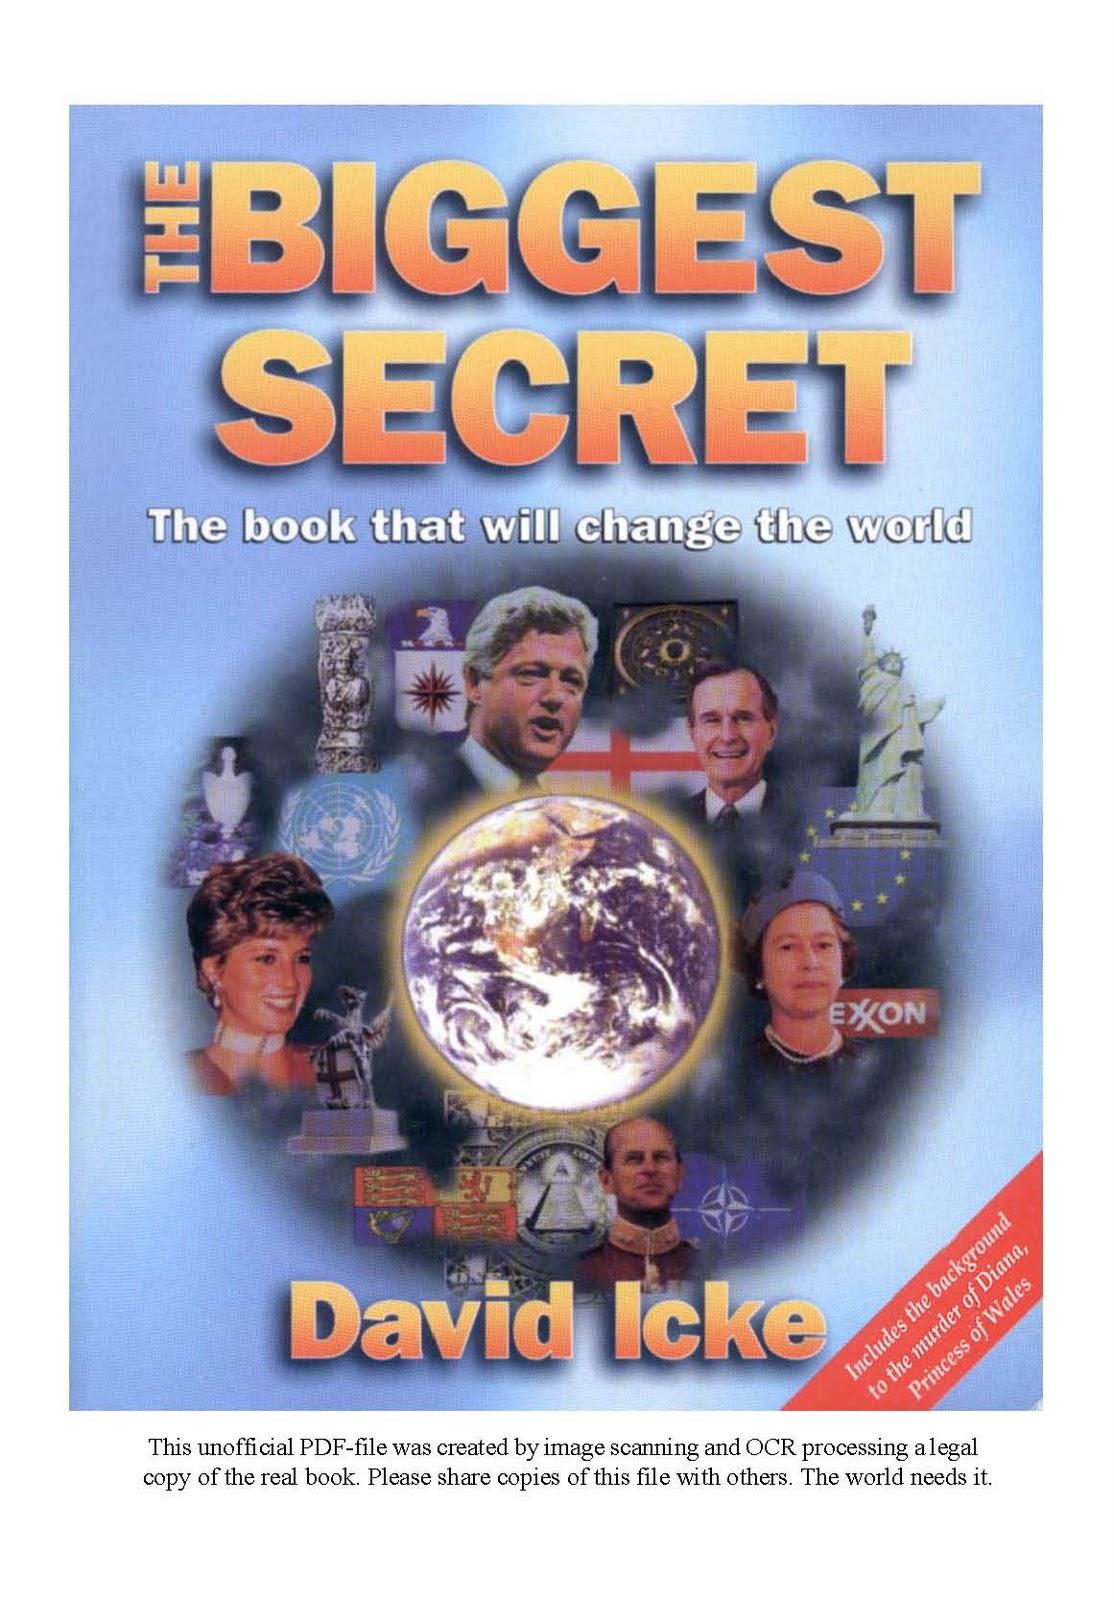 The biggest secret ebook free download